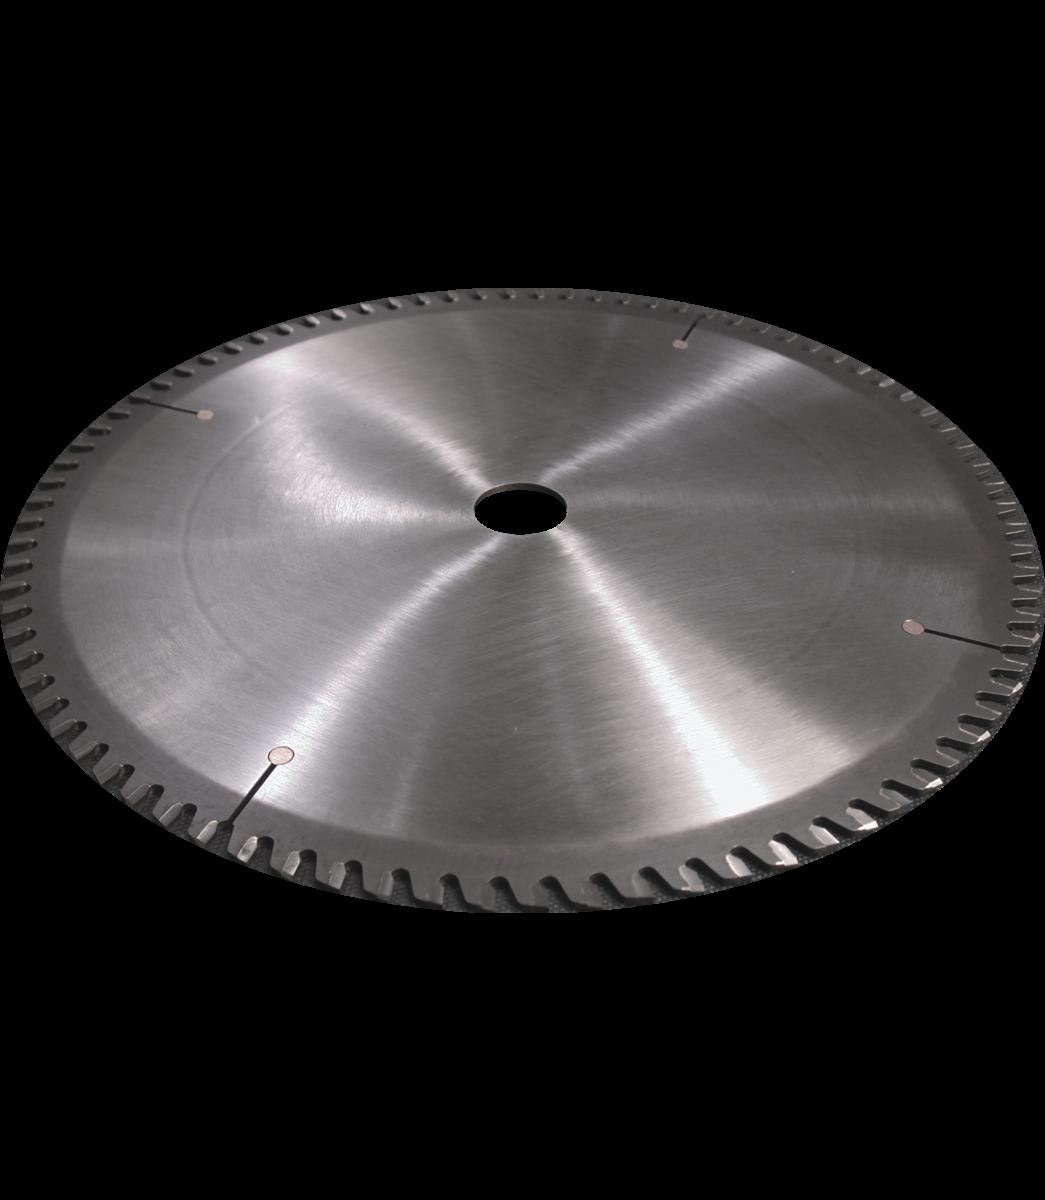 Non-Ferrous Carbide Circular Saw Blade 350mm x 32mm x 3.4mm x 108T For J-CK350-2/4K